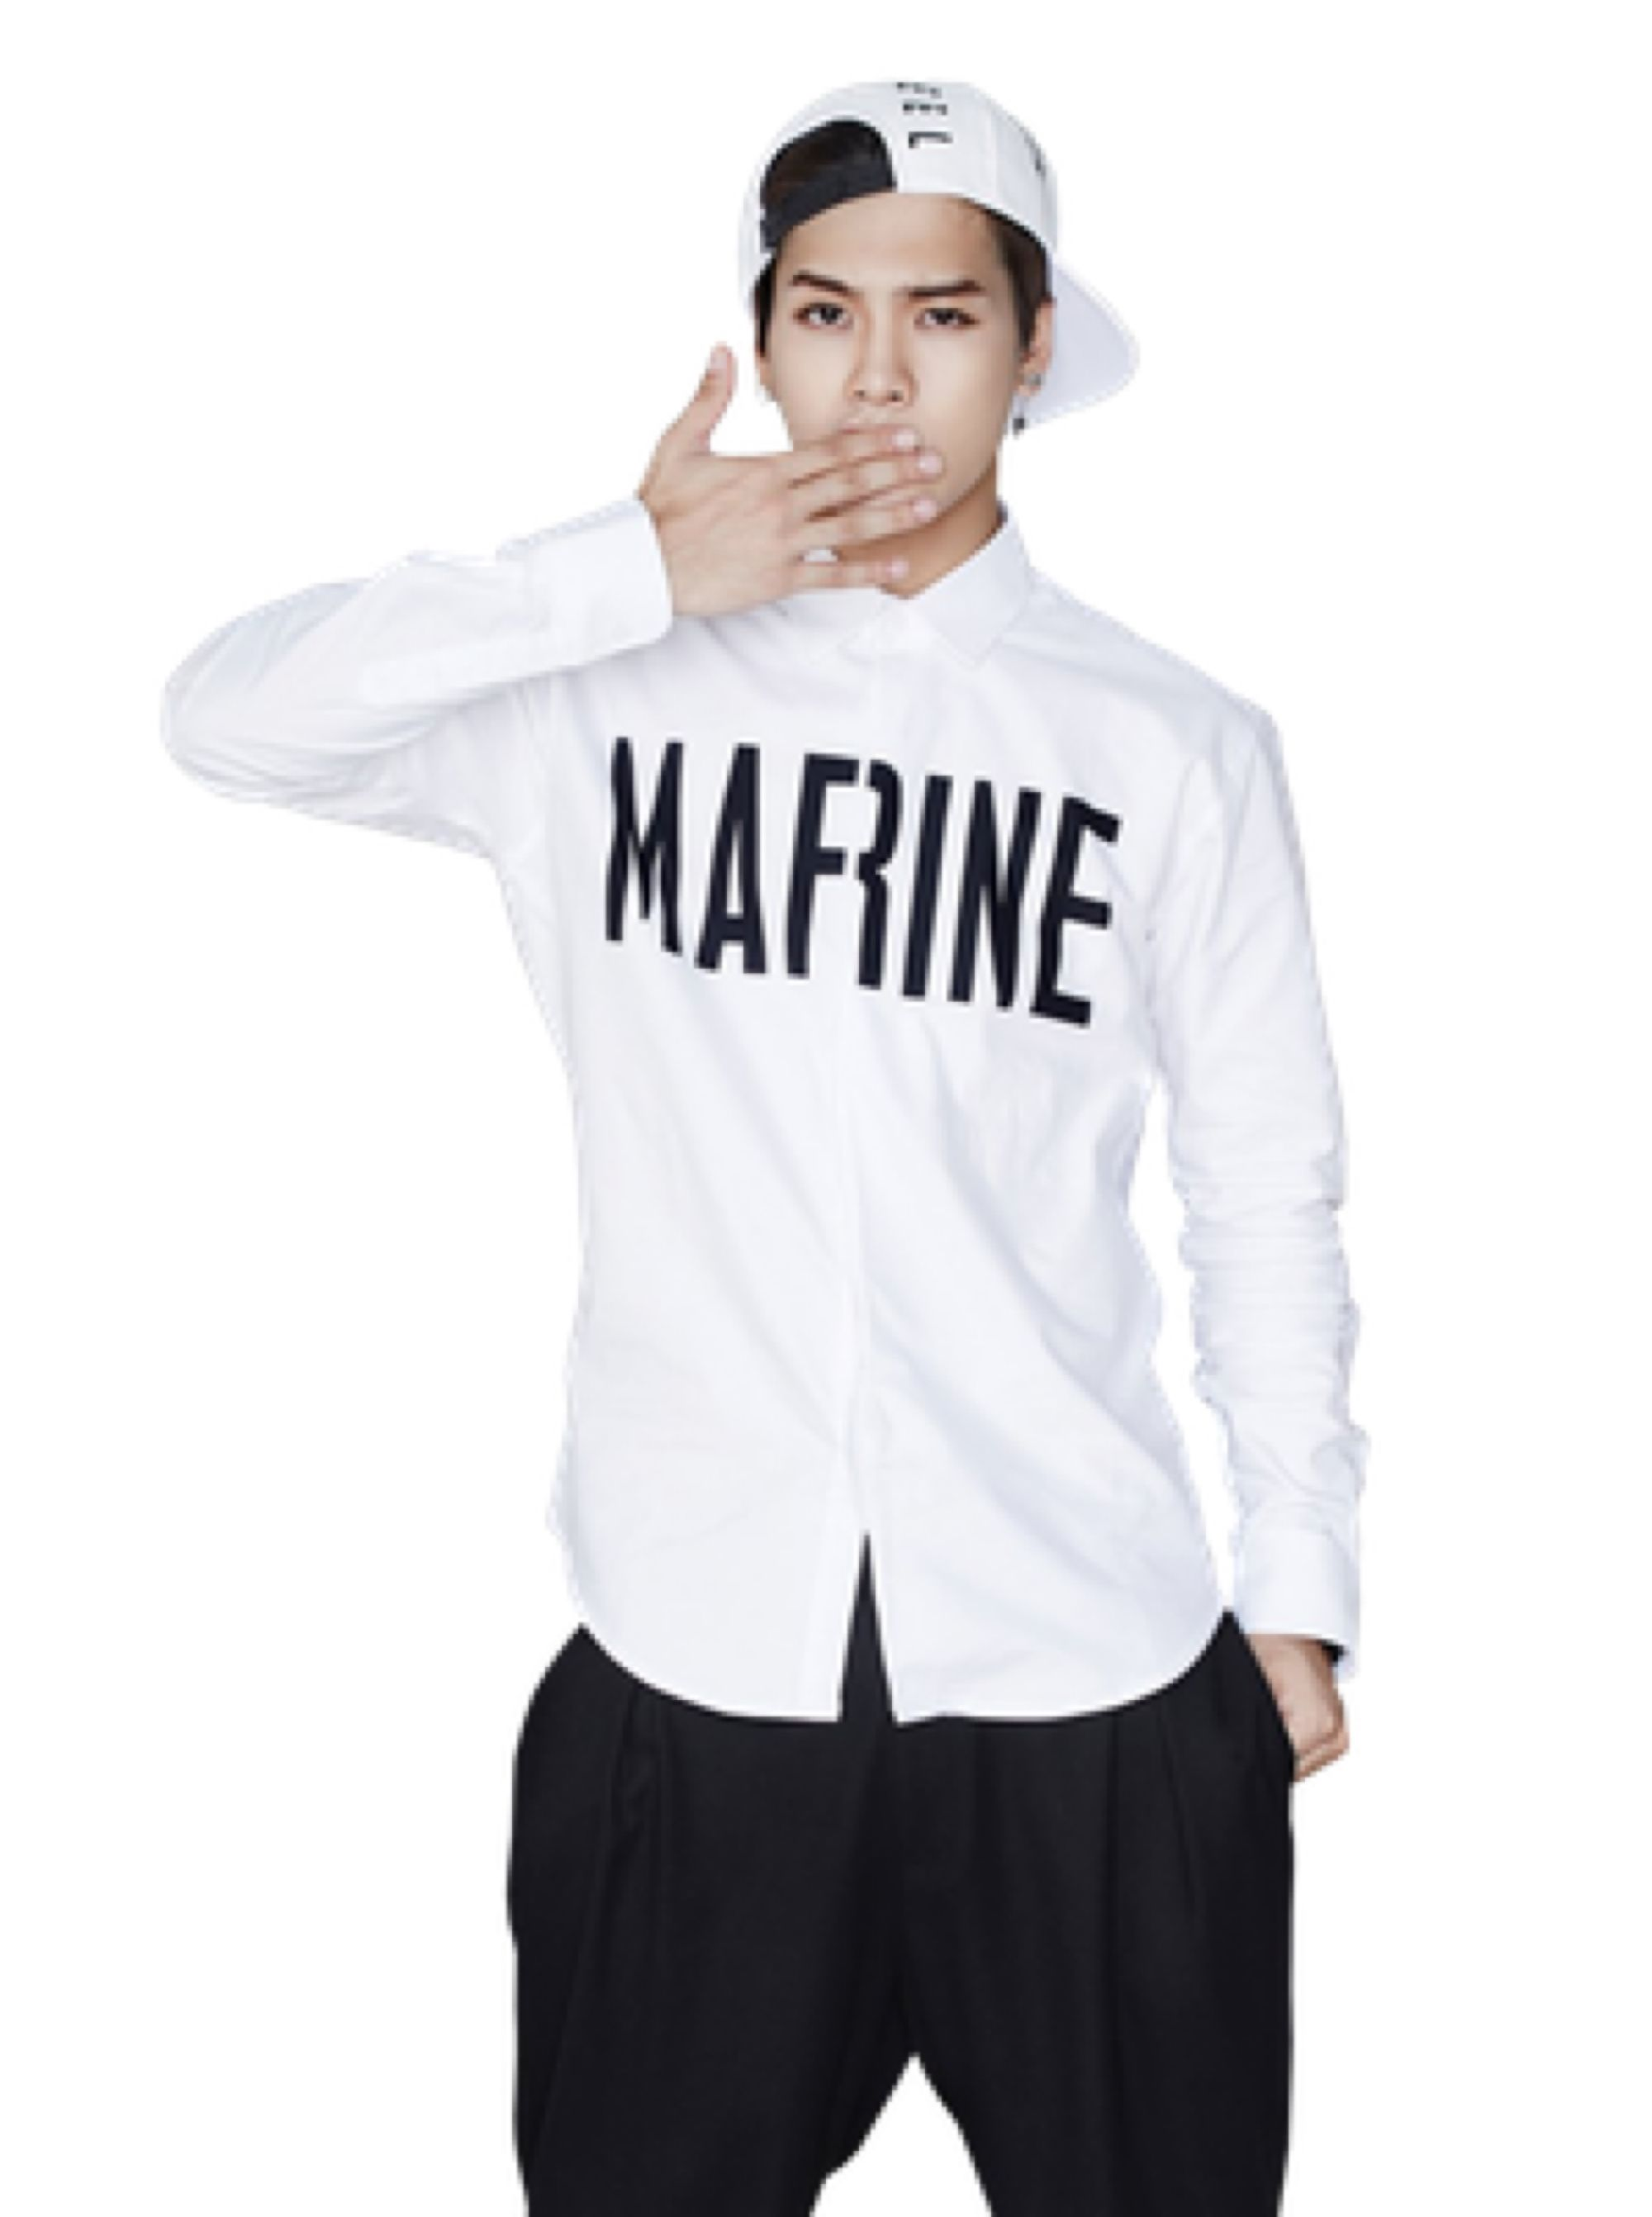 Png Jackson Got7 By Chazzief On Deviantart Adidas Jacket Athletic Jacket Jackson